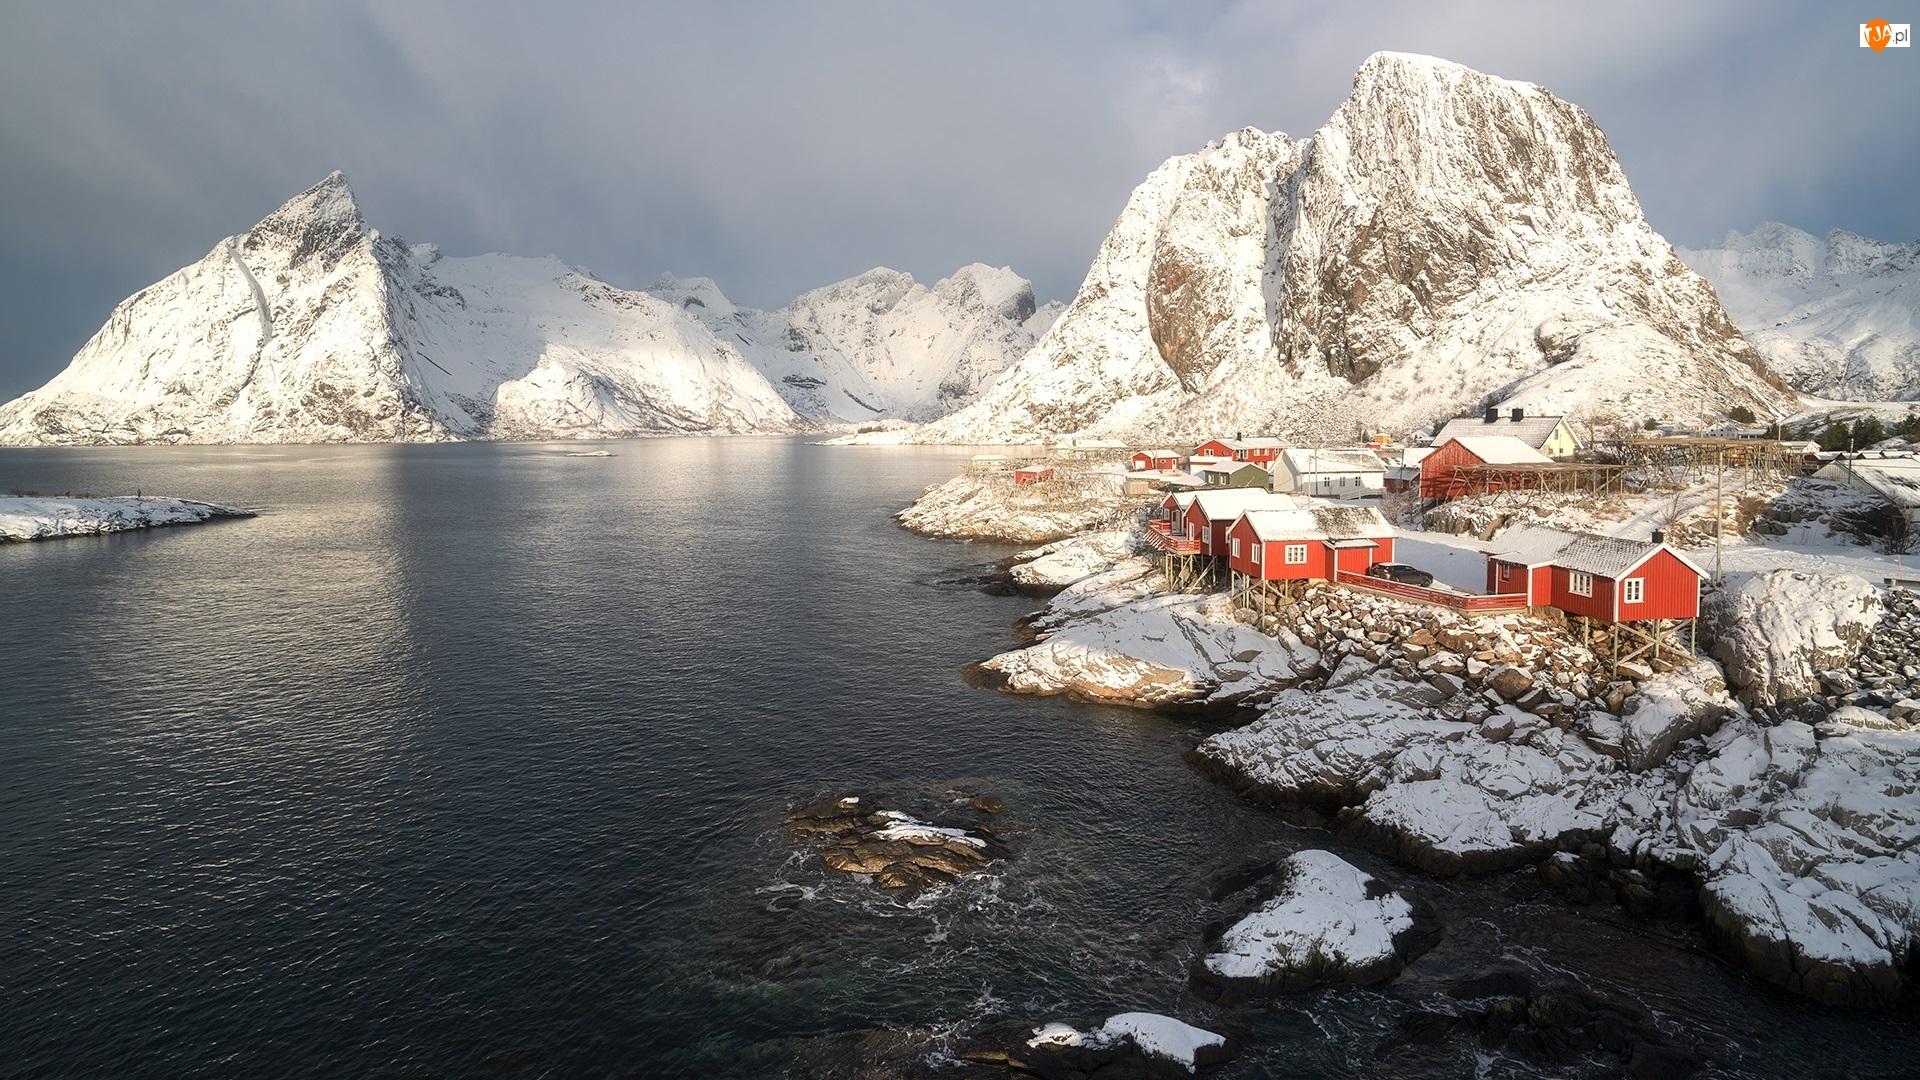 Góra Higravstinden, Norwegia, Morze, Wioska Hamnoy, Lofoty, Góry, Zima, Domy